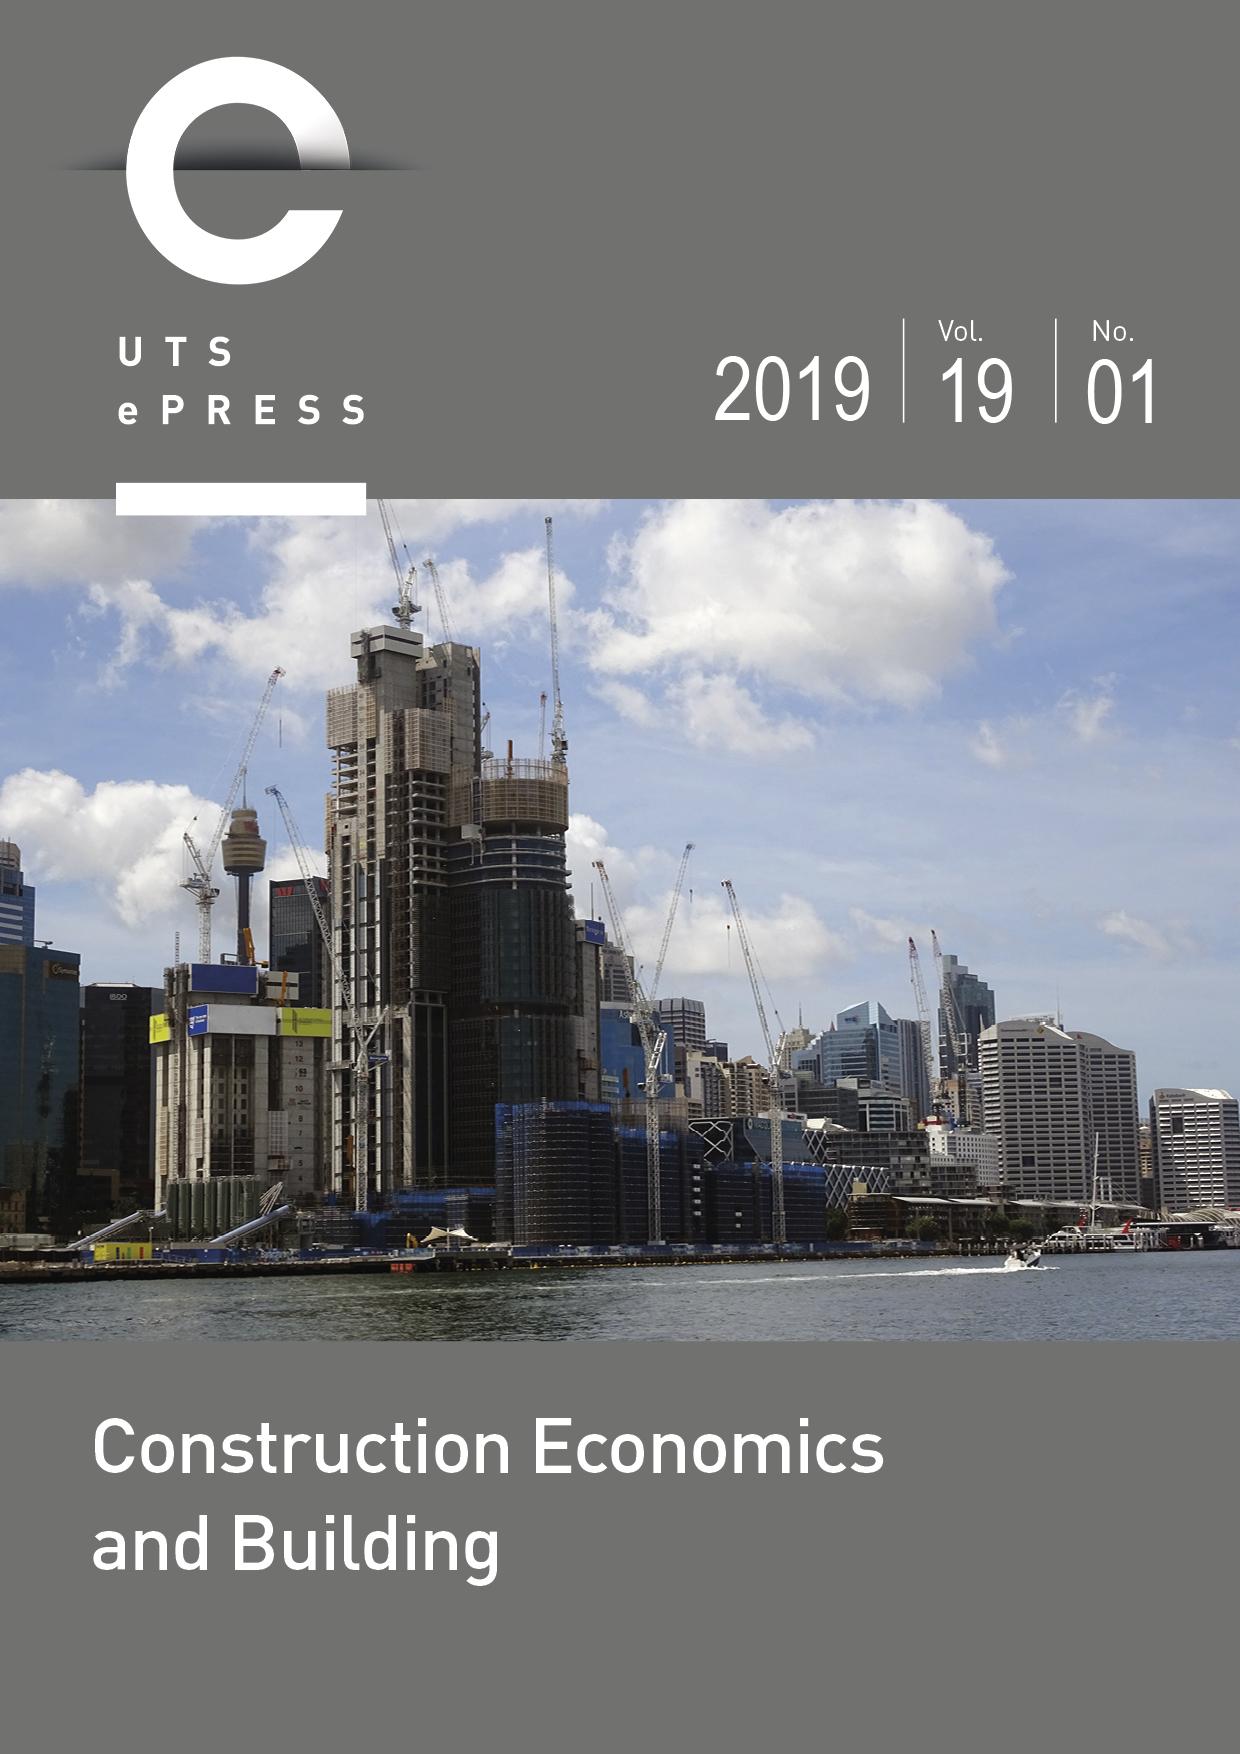 Construction Economics and Building